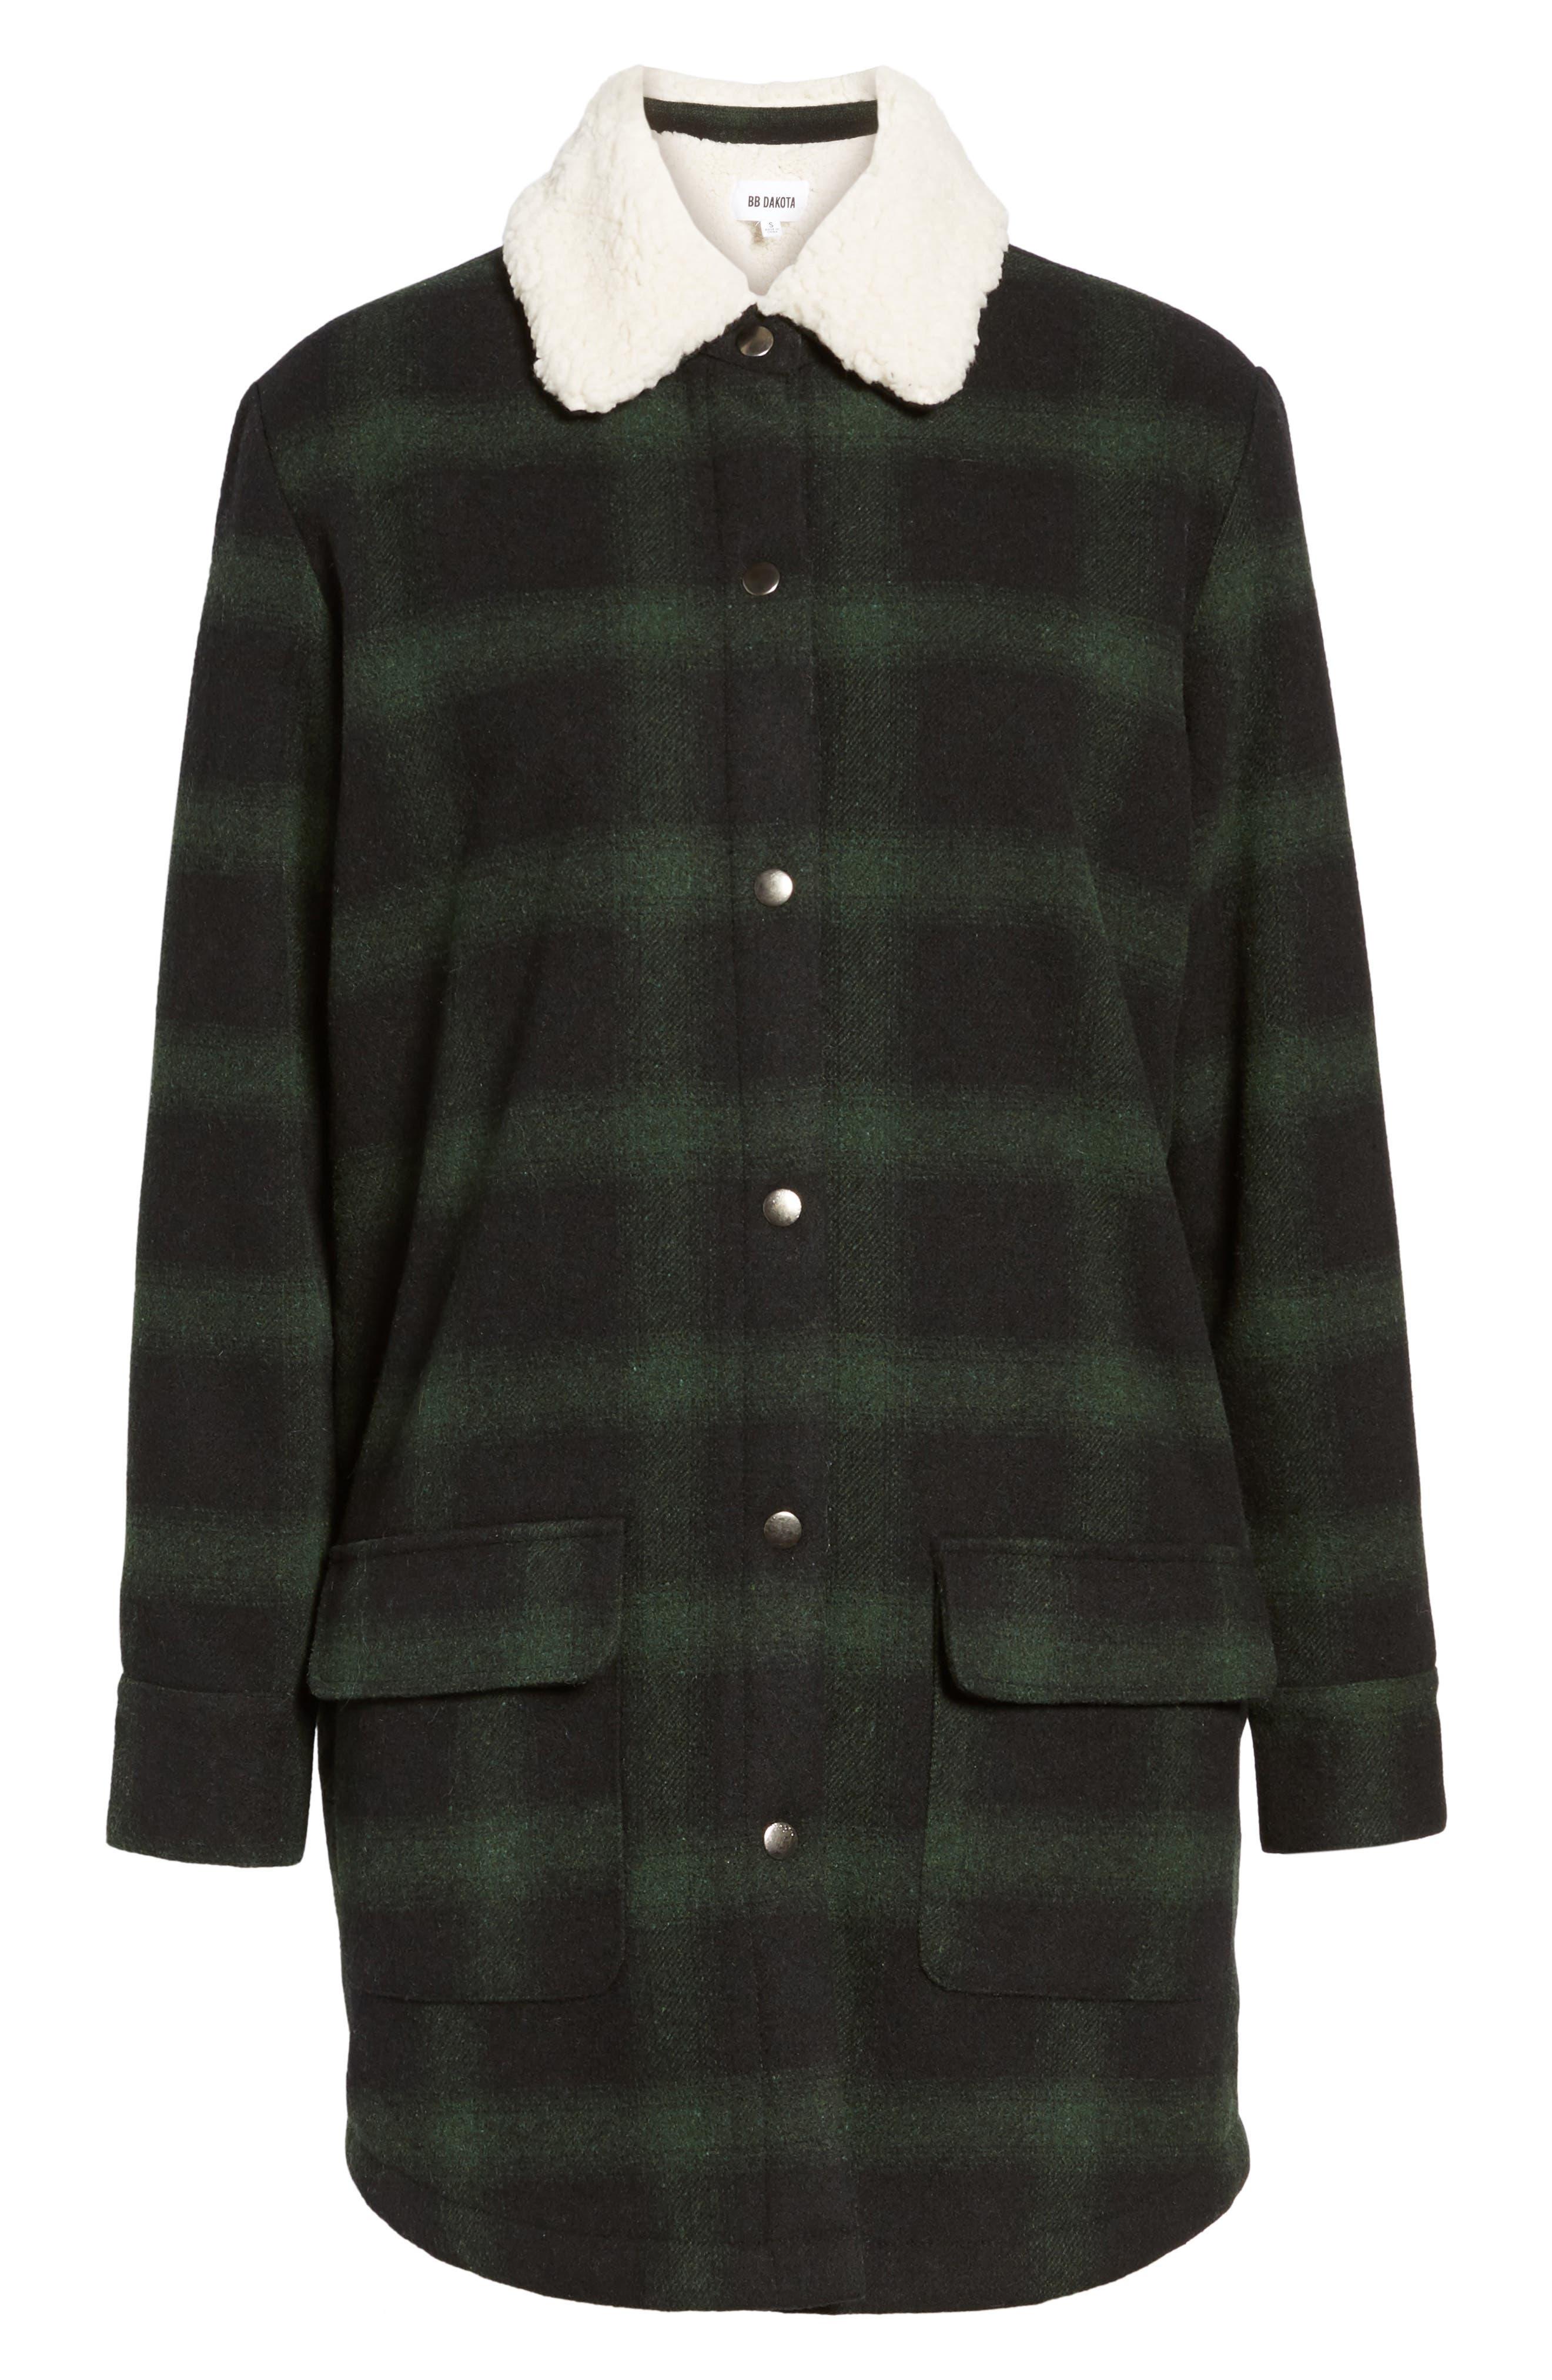 Bradley Fleece Lined Plaid Coat,                             Alternate thumbnail 5, color,                             301